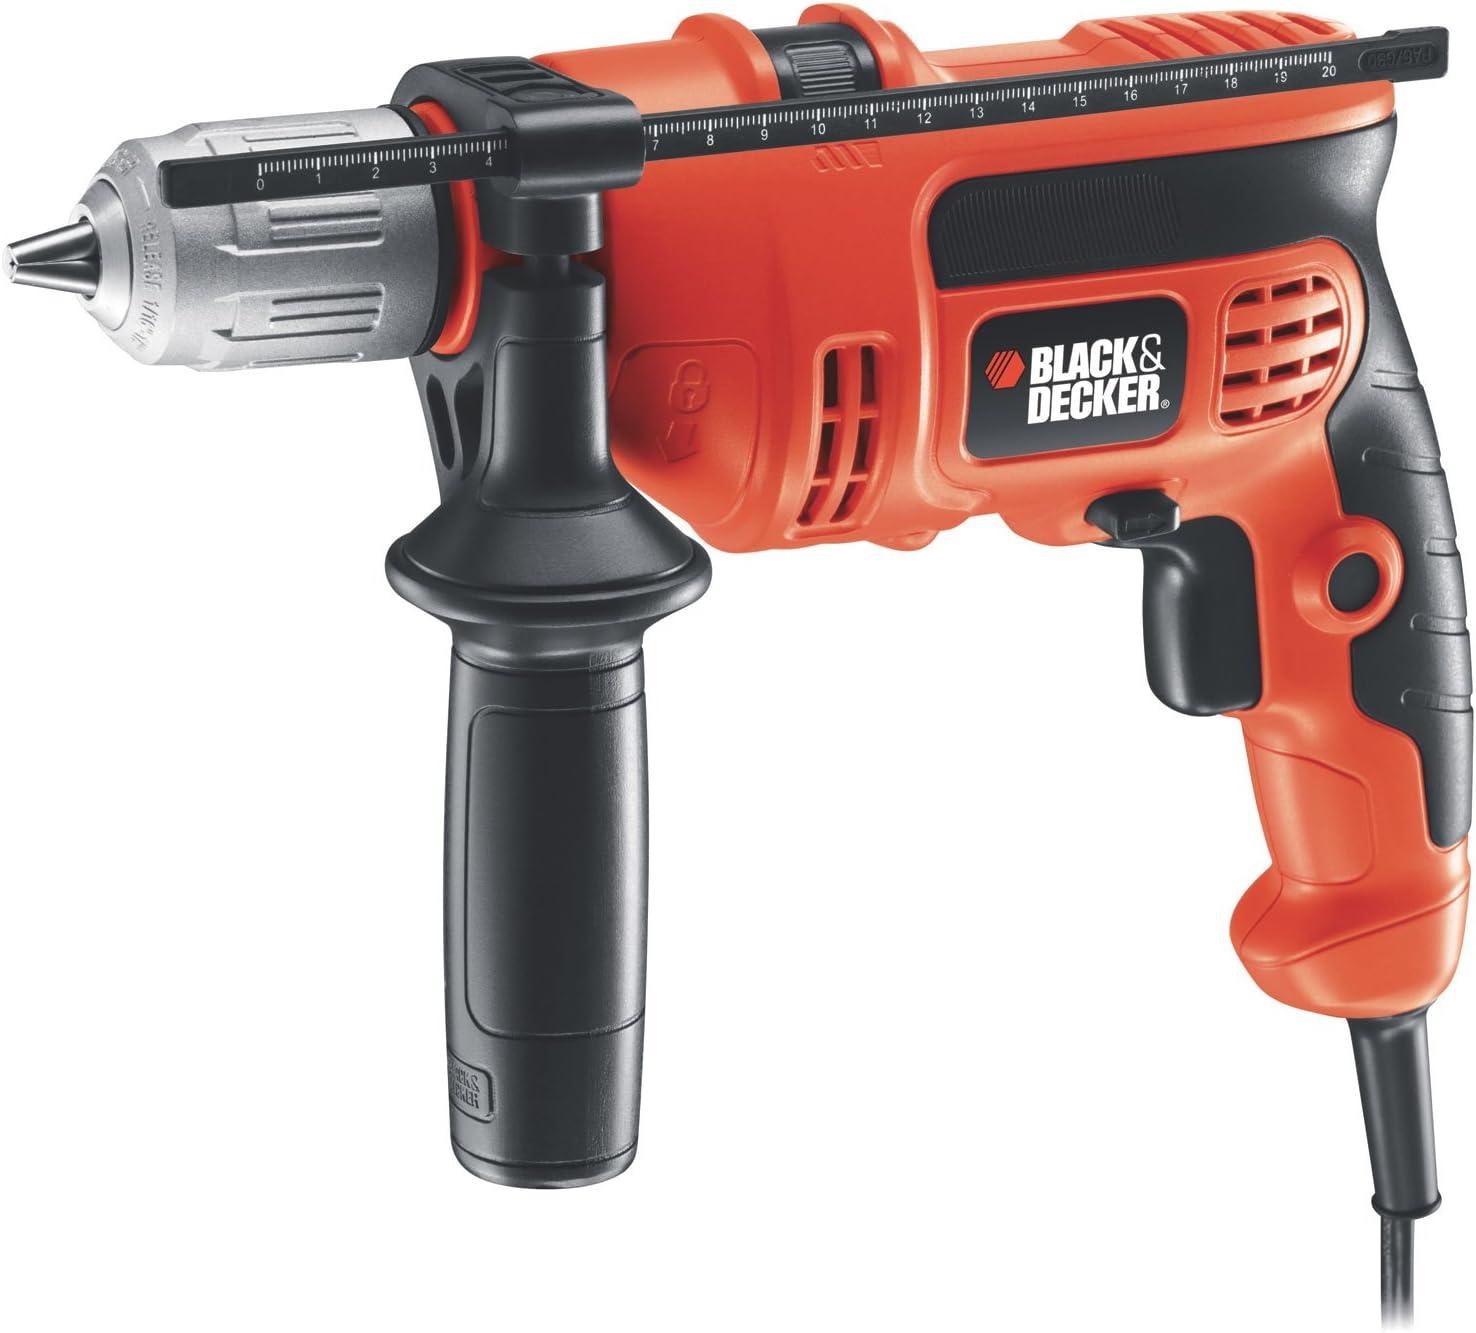 Black-&-Decker-DR670-Hammer-Drill